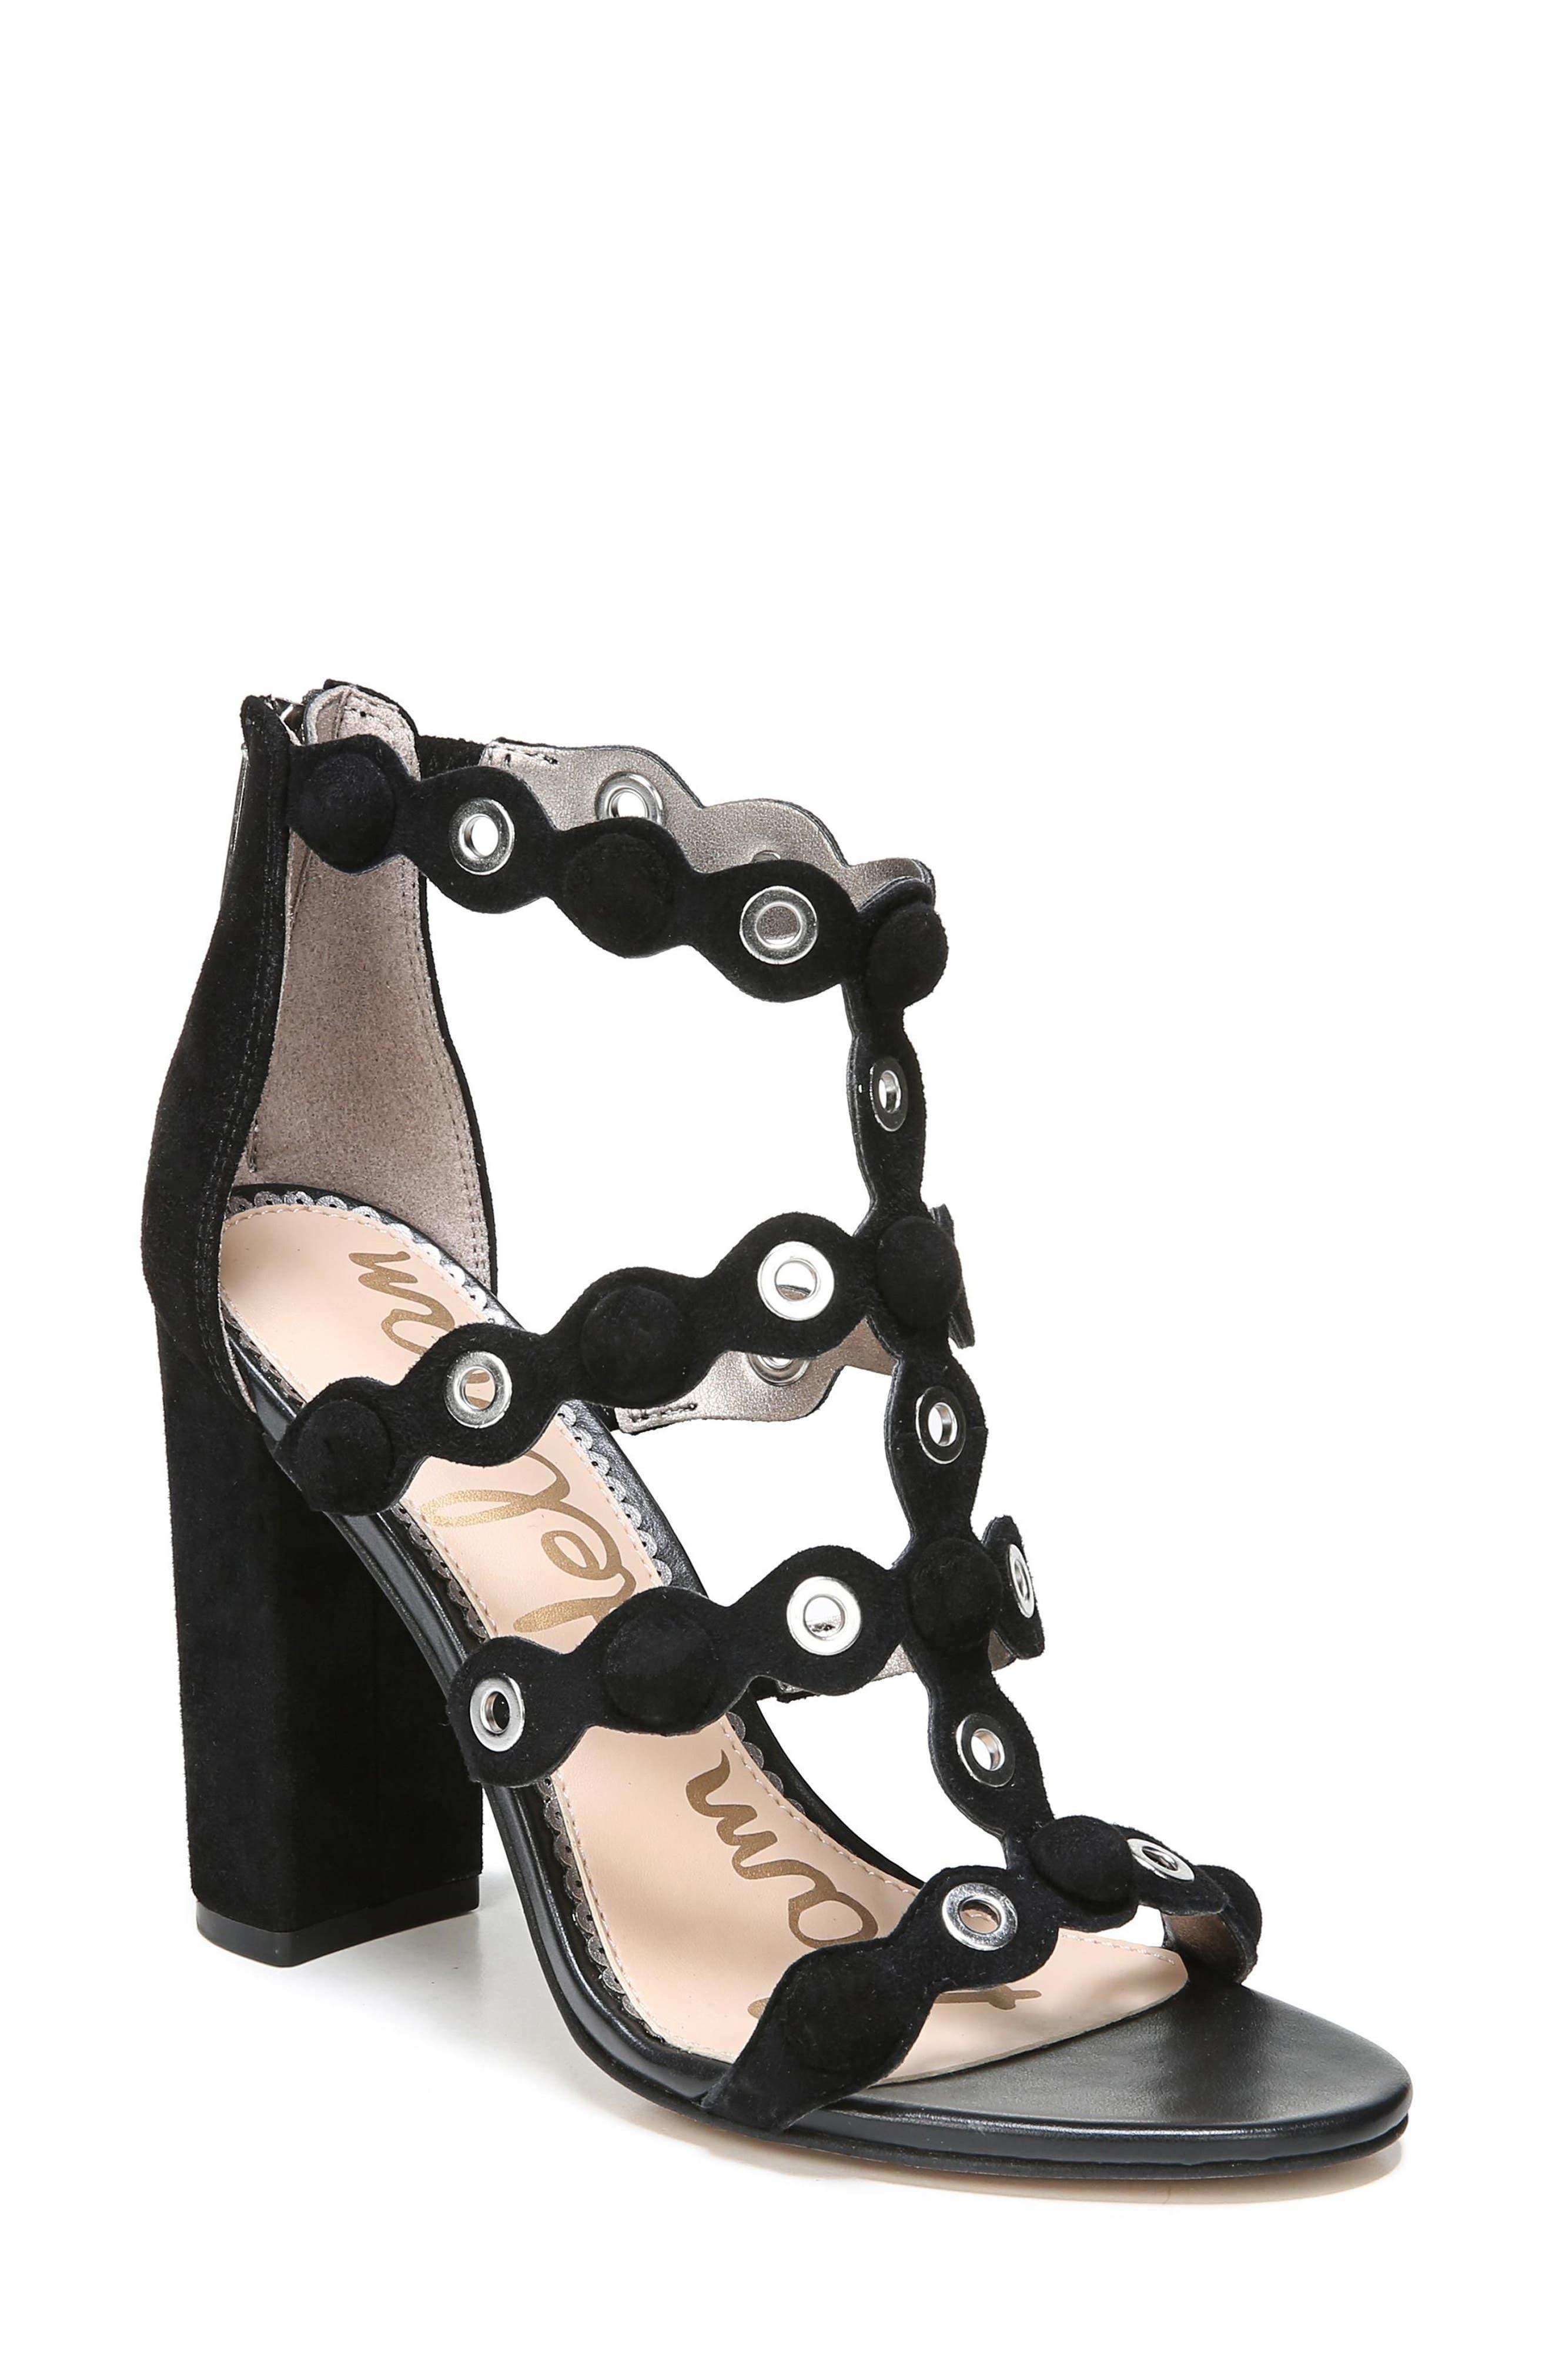 Yuli Grommet Sandal,                         Main,                         color, BLACK LEATHER